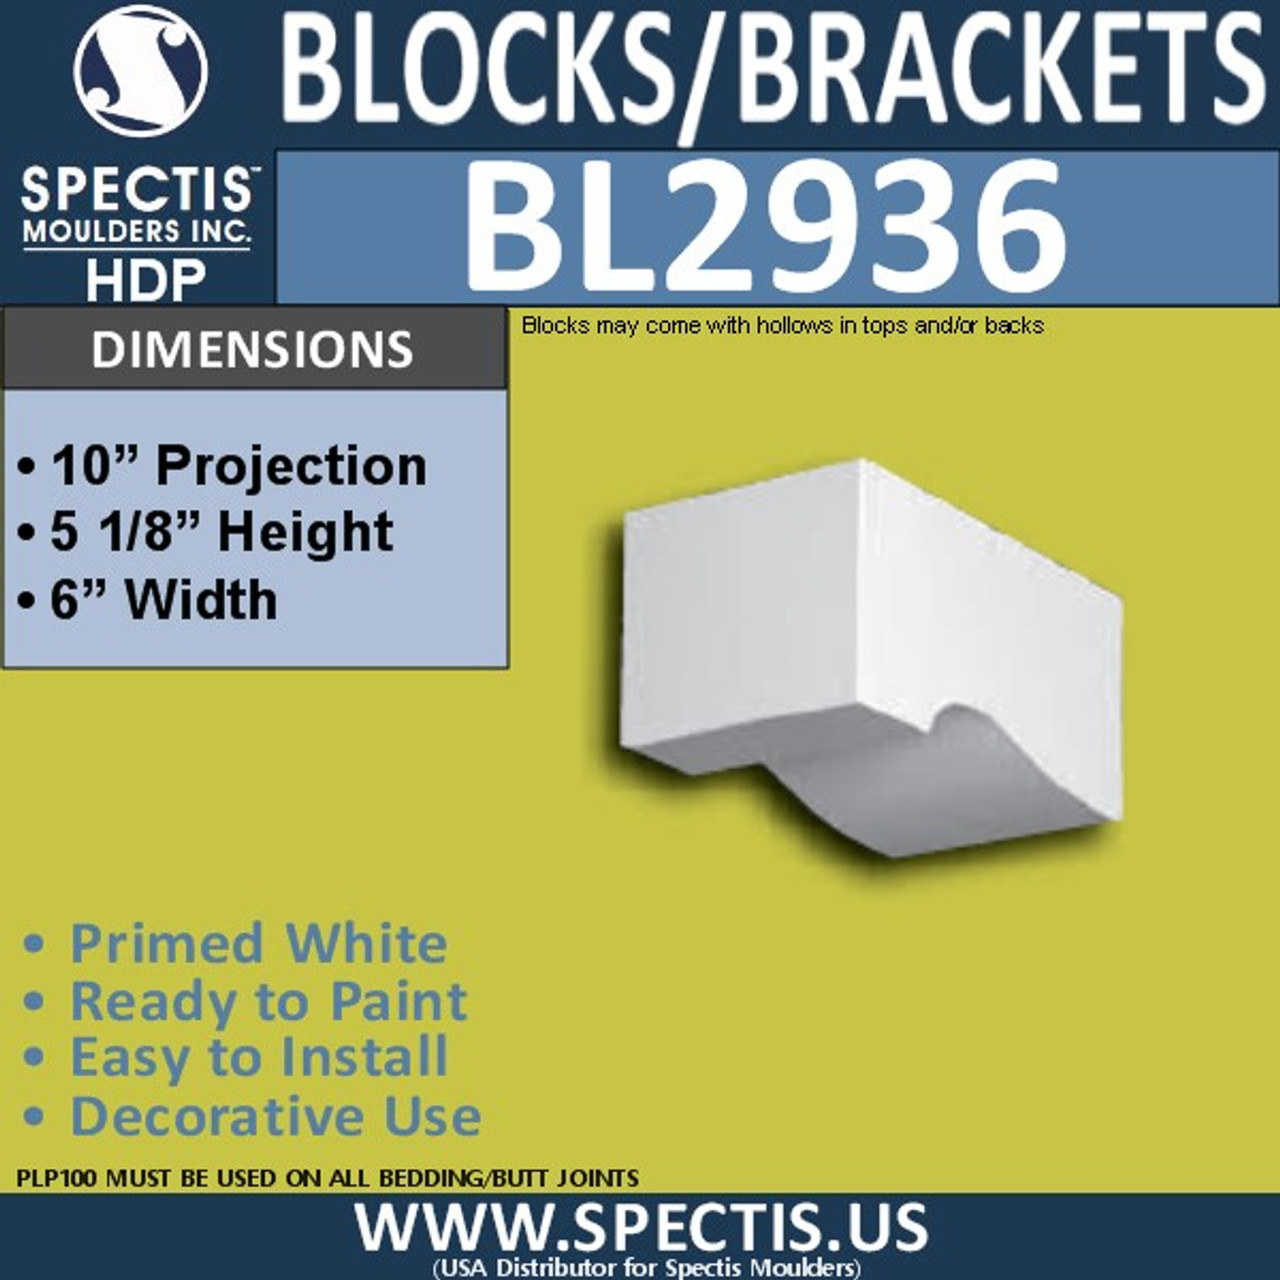 "BL2936 Eave Block or Bracket 6""W x 5.2""H x 10"" P"